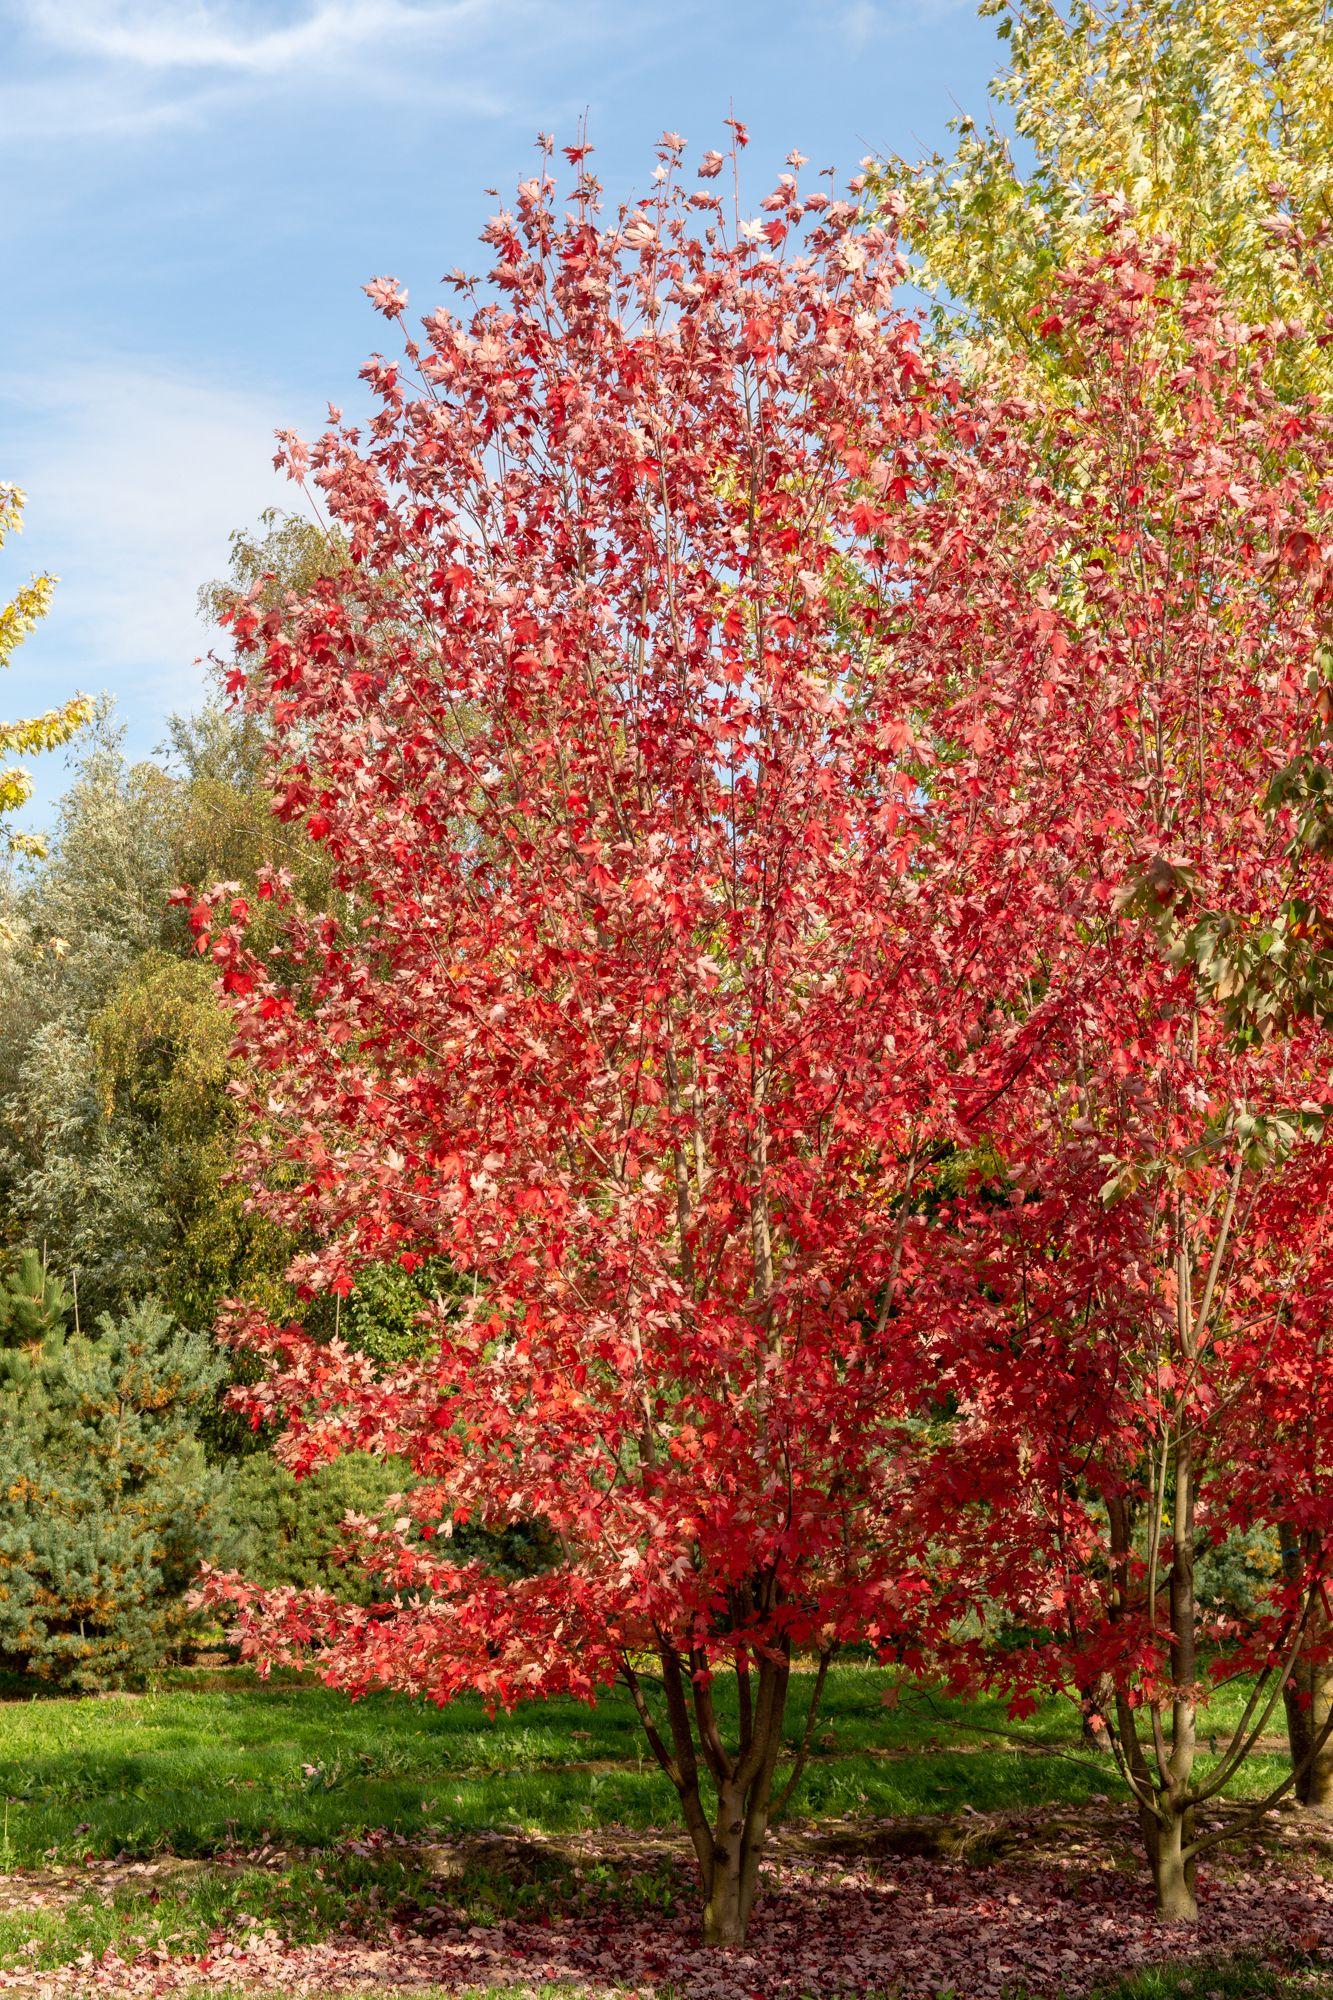 Acer X Freemanii Jeffersred Autumn Blaze Maple Street Tree